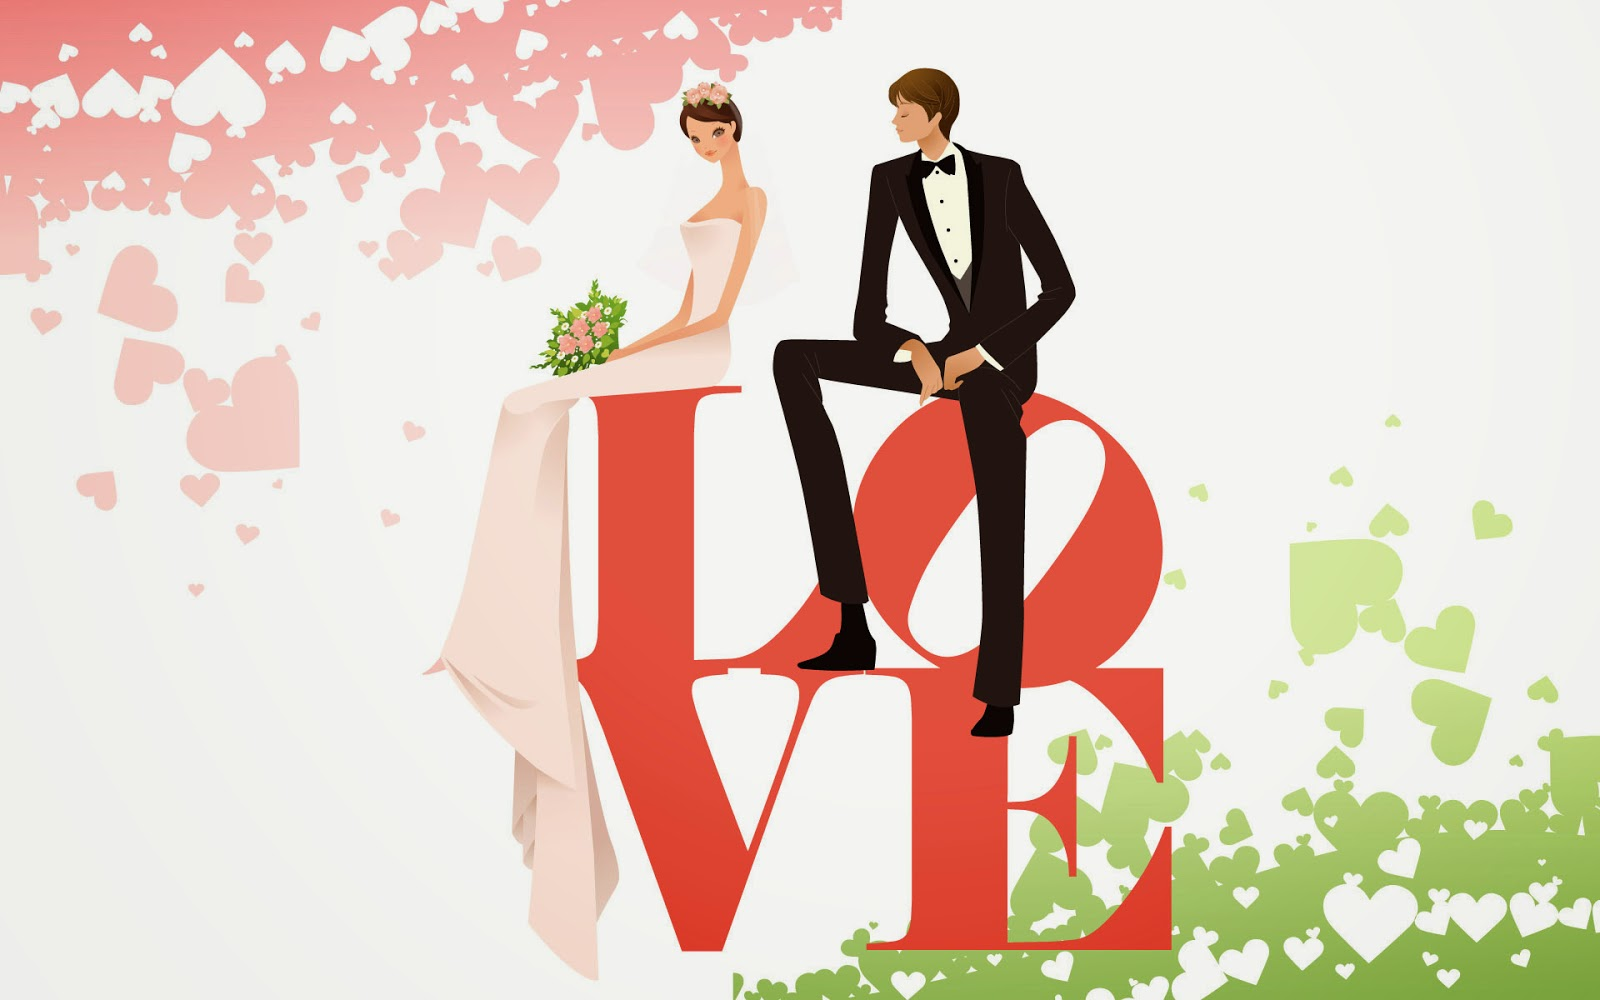 pasangan berkahwin